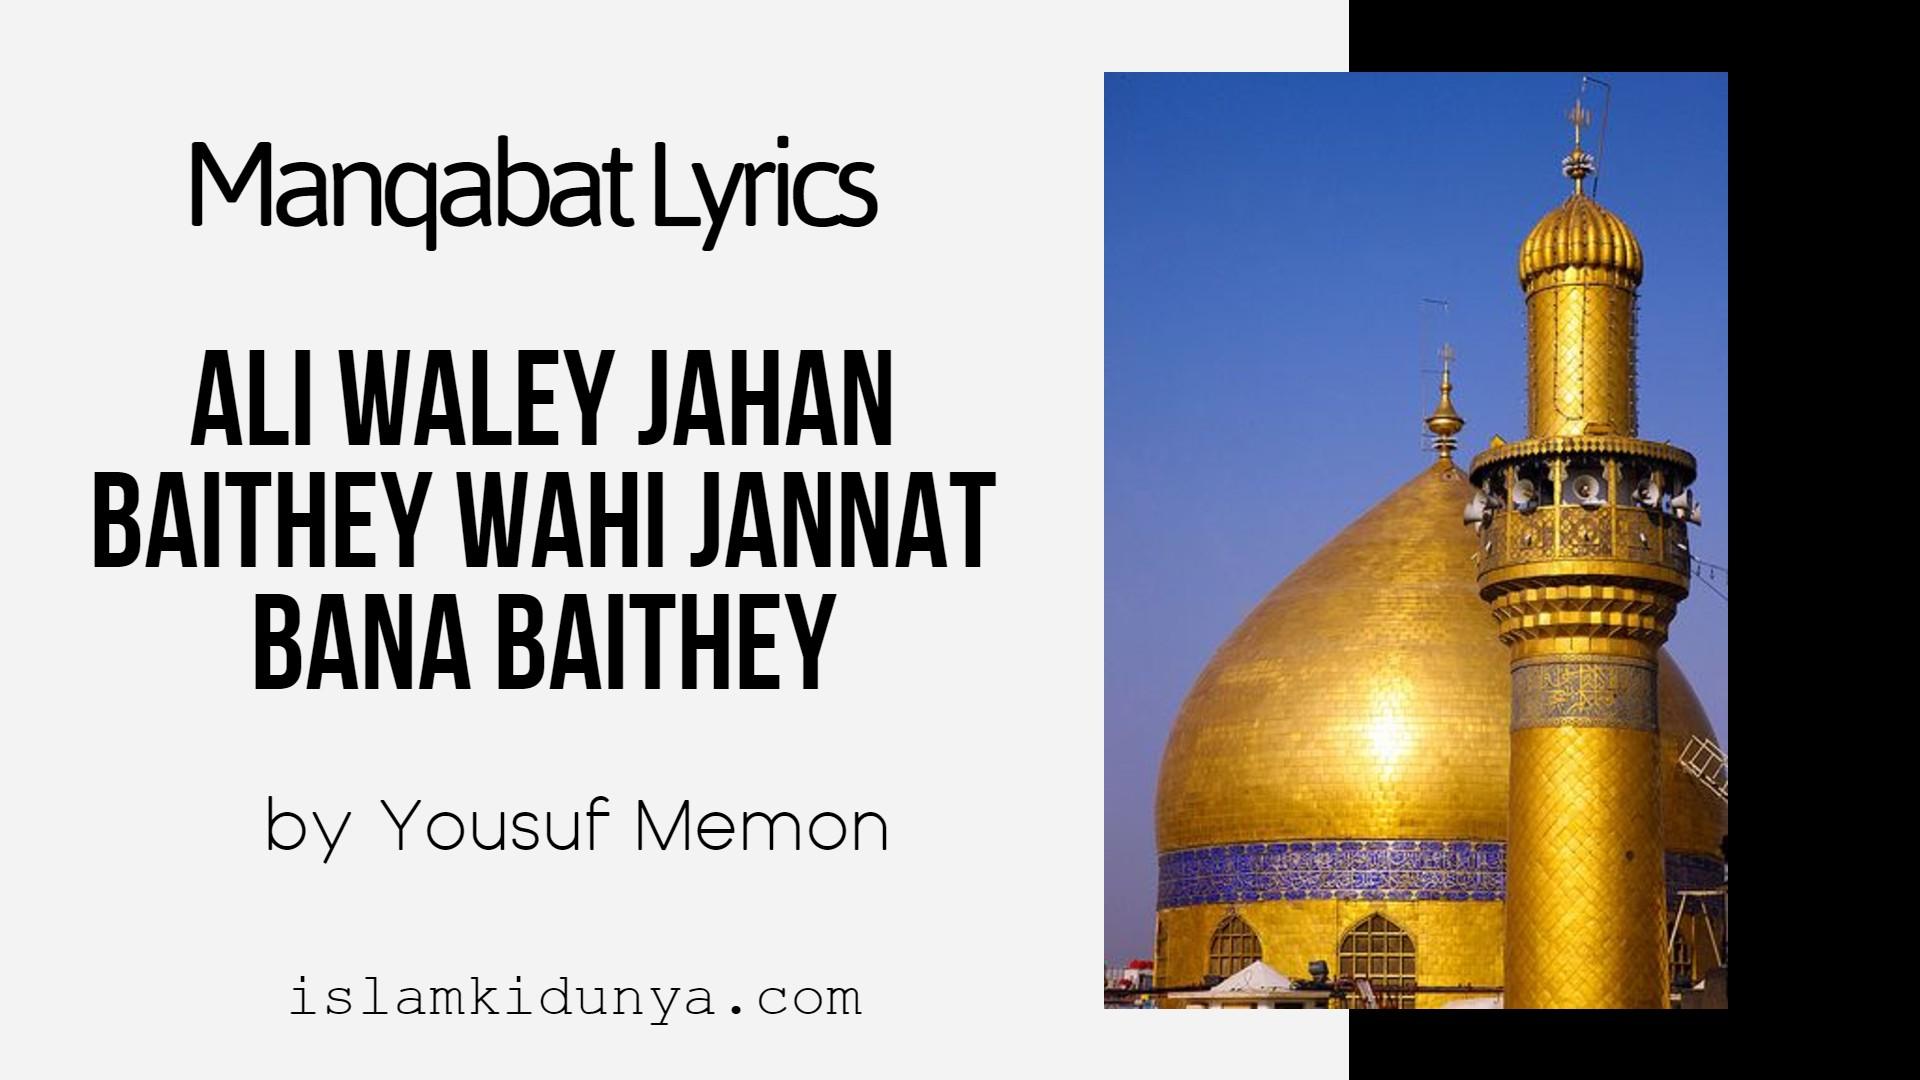 Ali Waley Jahan Baithey Wahi Jannat Bana Baithey - Manqabat Lyrics